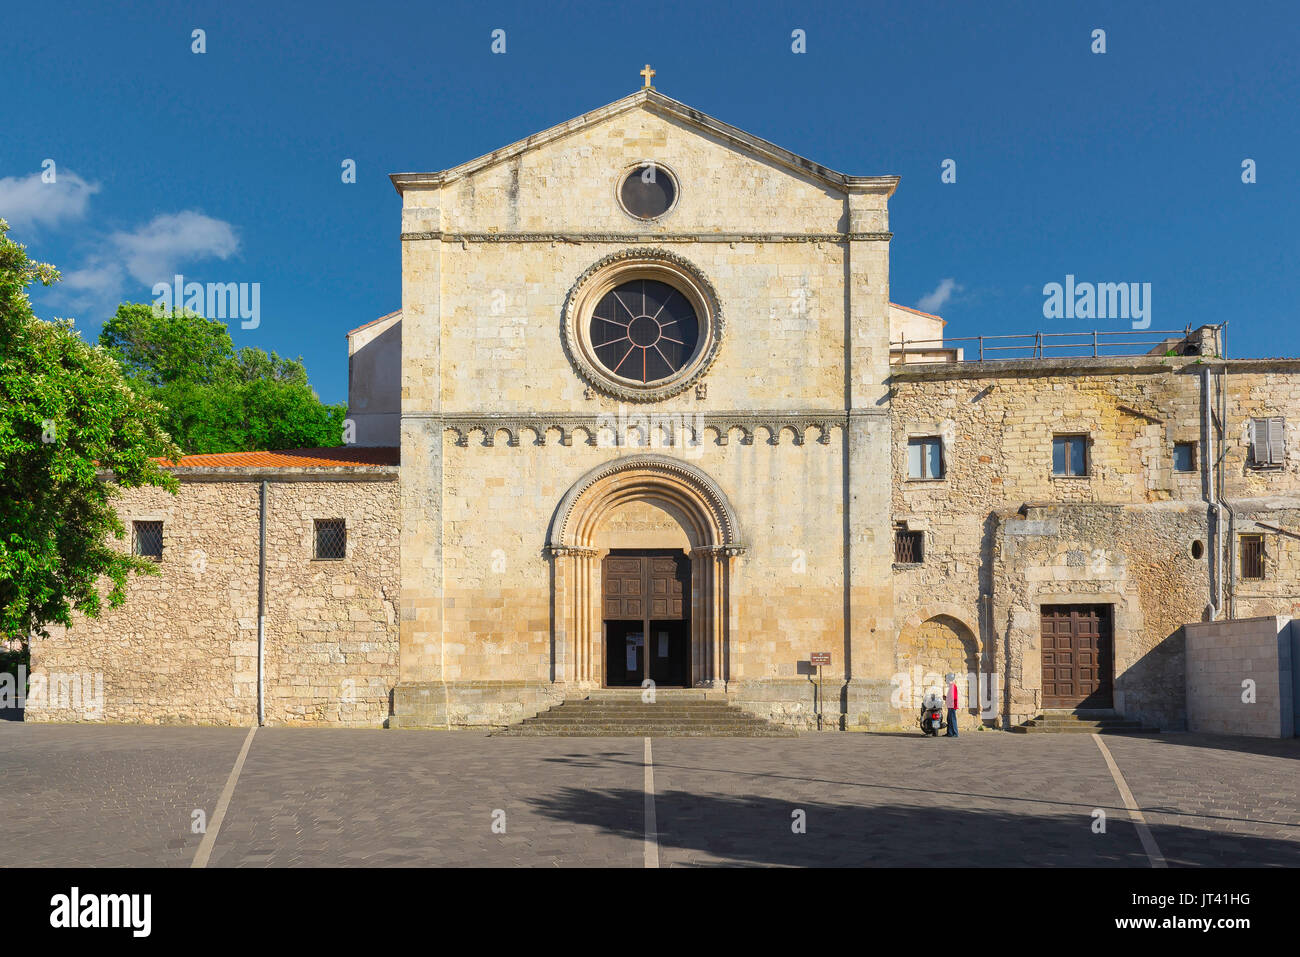 Sassari Sardinia church, the Romanesque west front of the Santa Maria di Betlem church in Sassari, Sardinia. - Stock Image